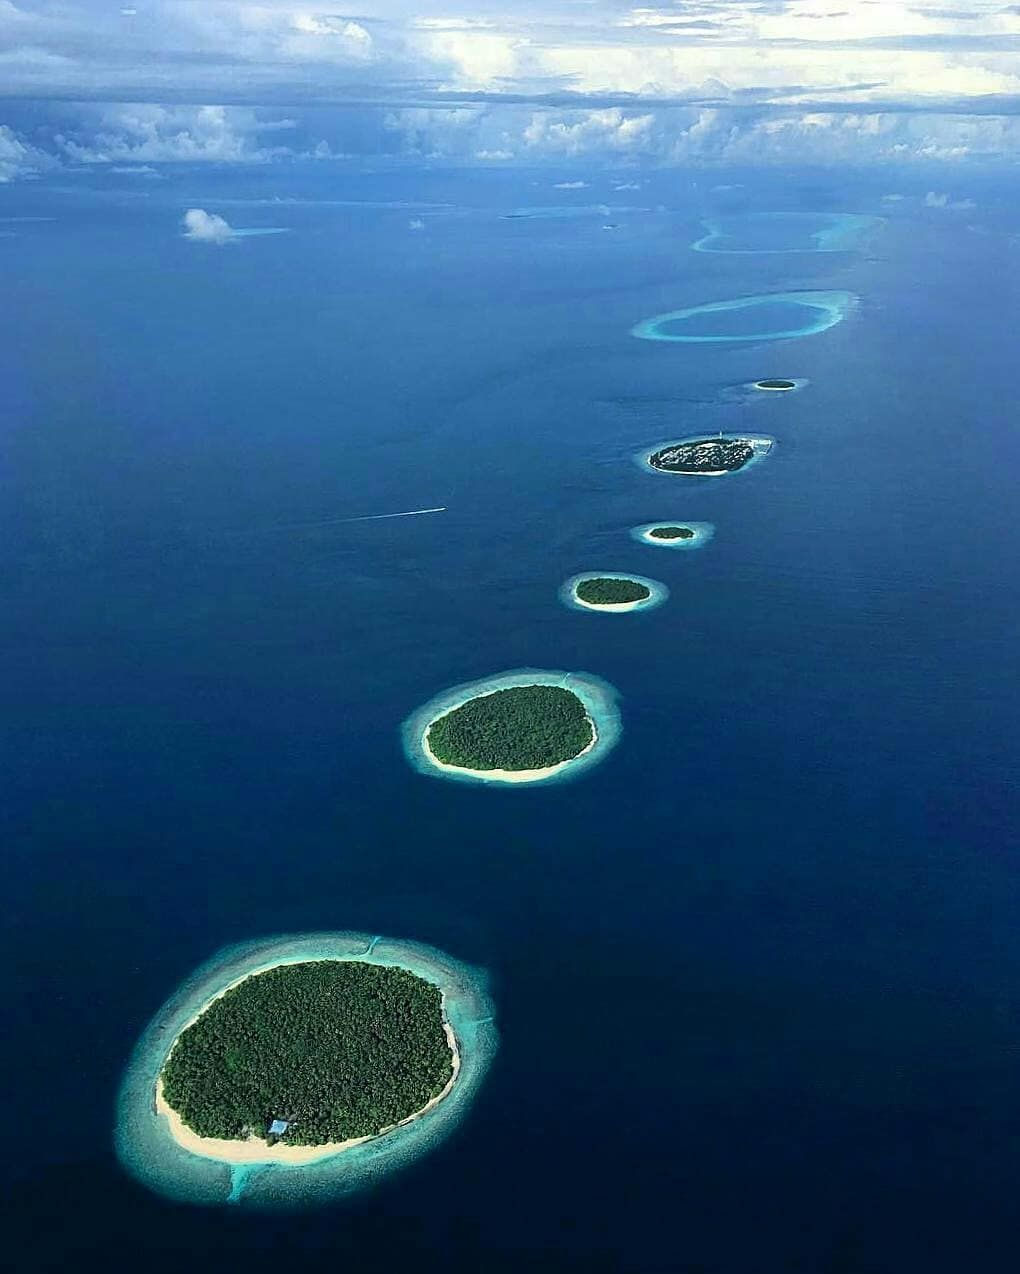 The Maldives Islands #Maldives Photo @nati.ko #blue